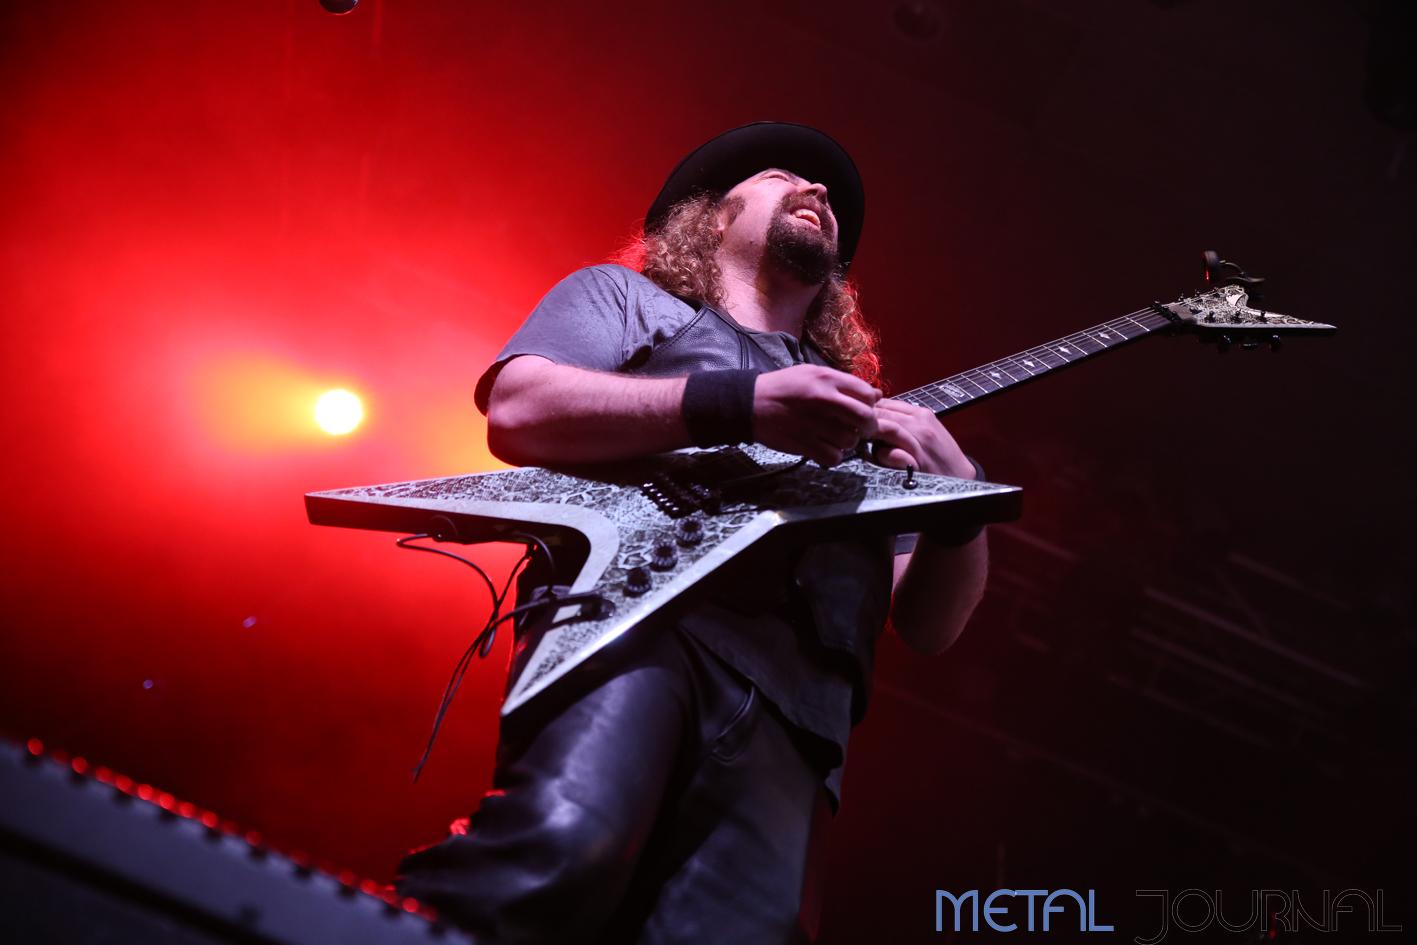 midnight eternal - metal journal bilbao 2018 pic 3